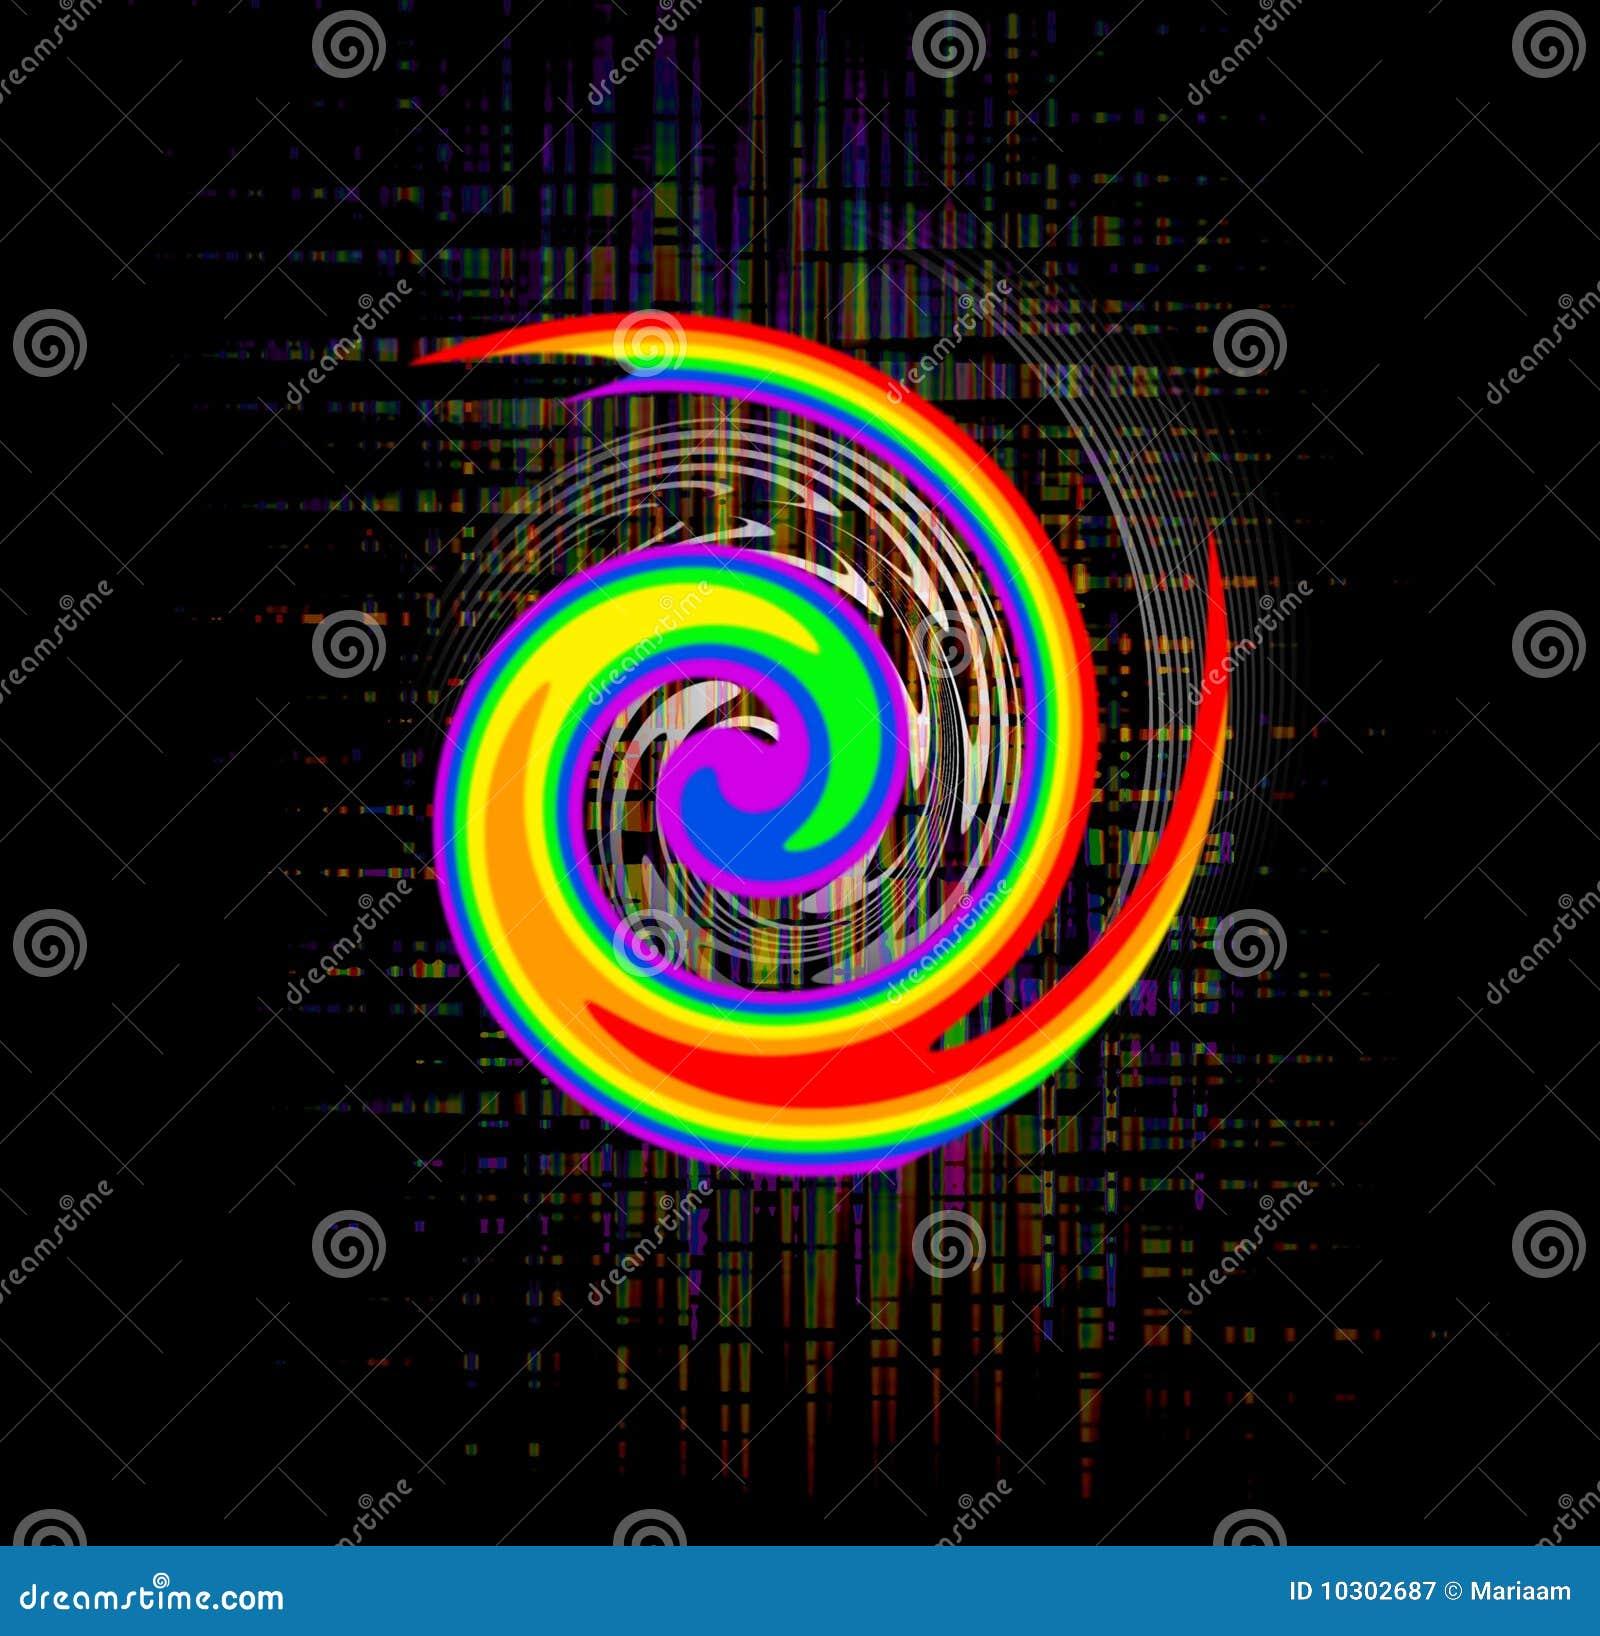 Abstracte regenboogwerveling